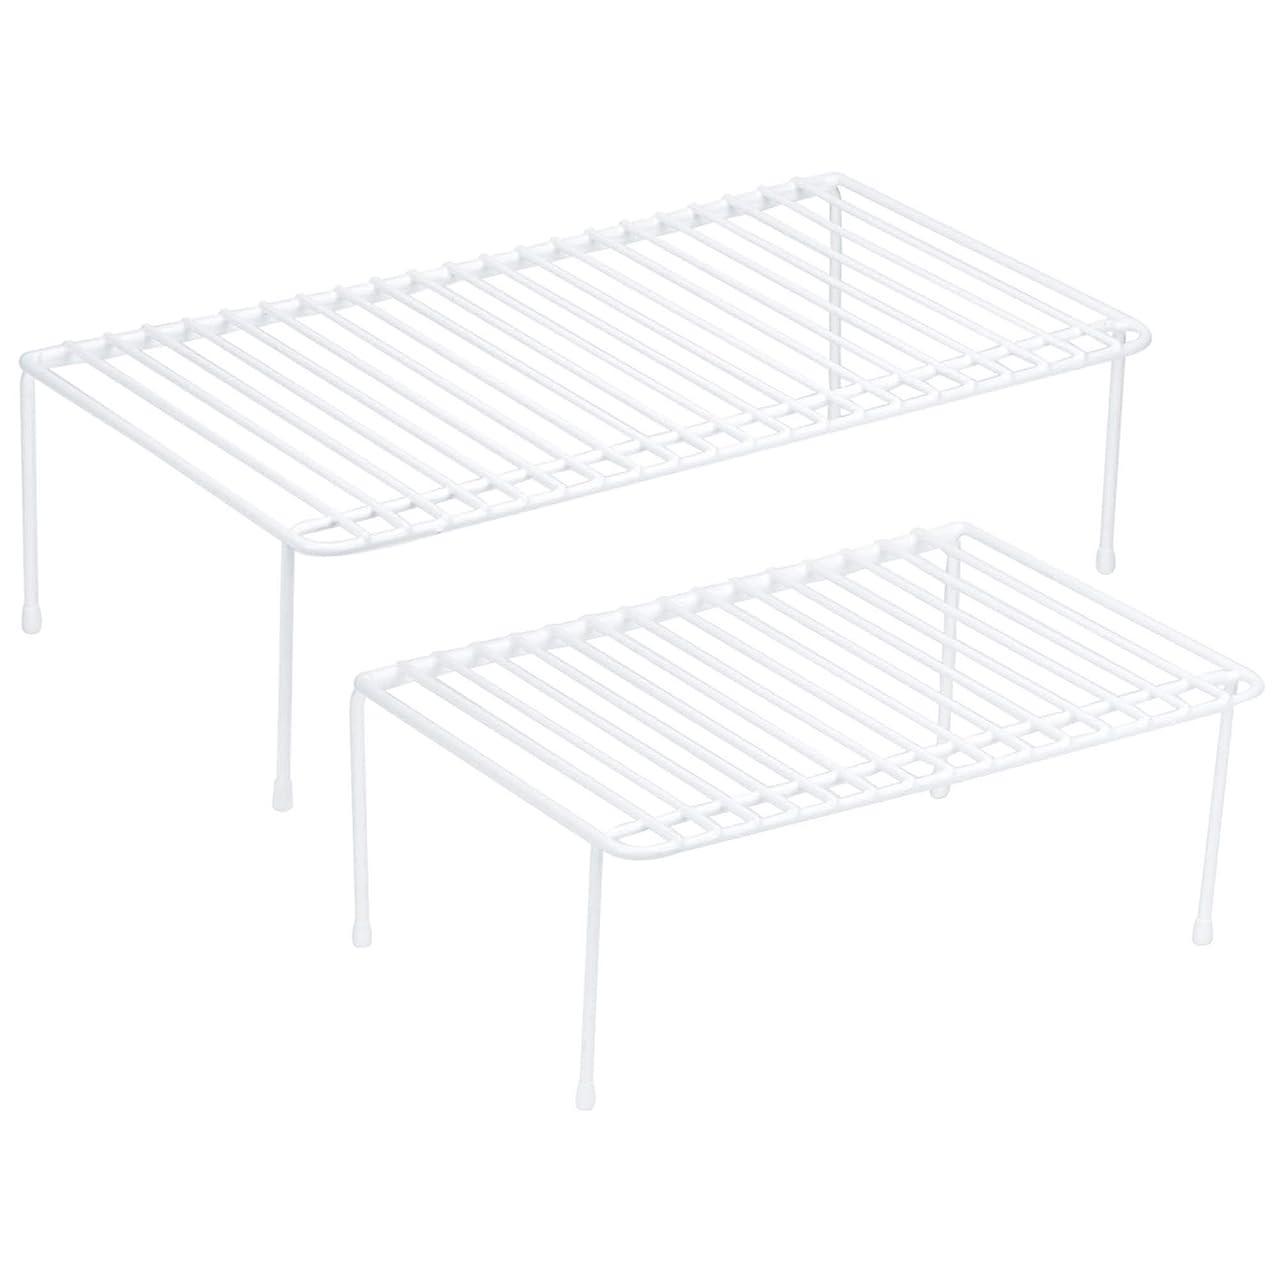 DecorRack Set of 2 Counter Helper Wire Shelf, Kitchen Cabinet Shelf Organizer, Closet and Pantry Storage Extra Rack, Freezer Instant Space Organizer, Steel with White Plastic Coating bruyxegcyjuwv245